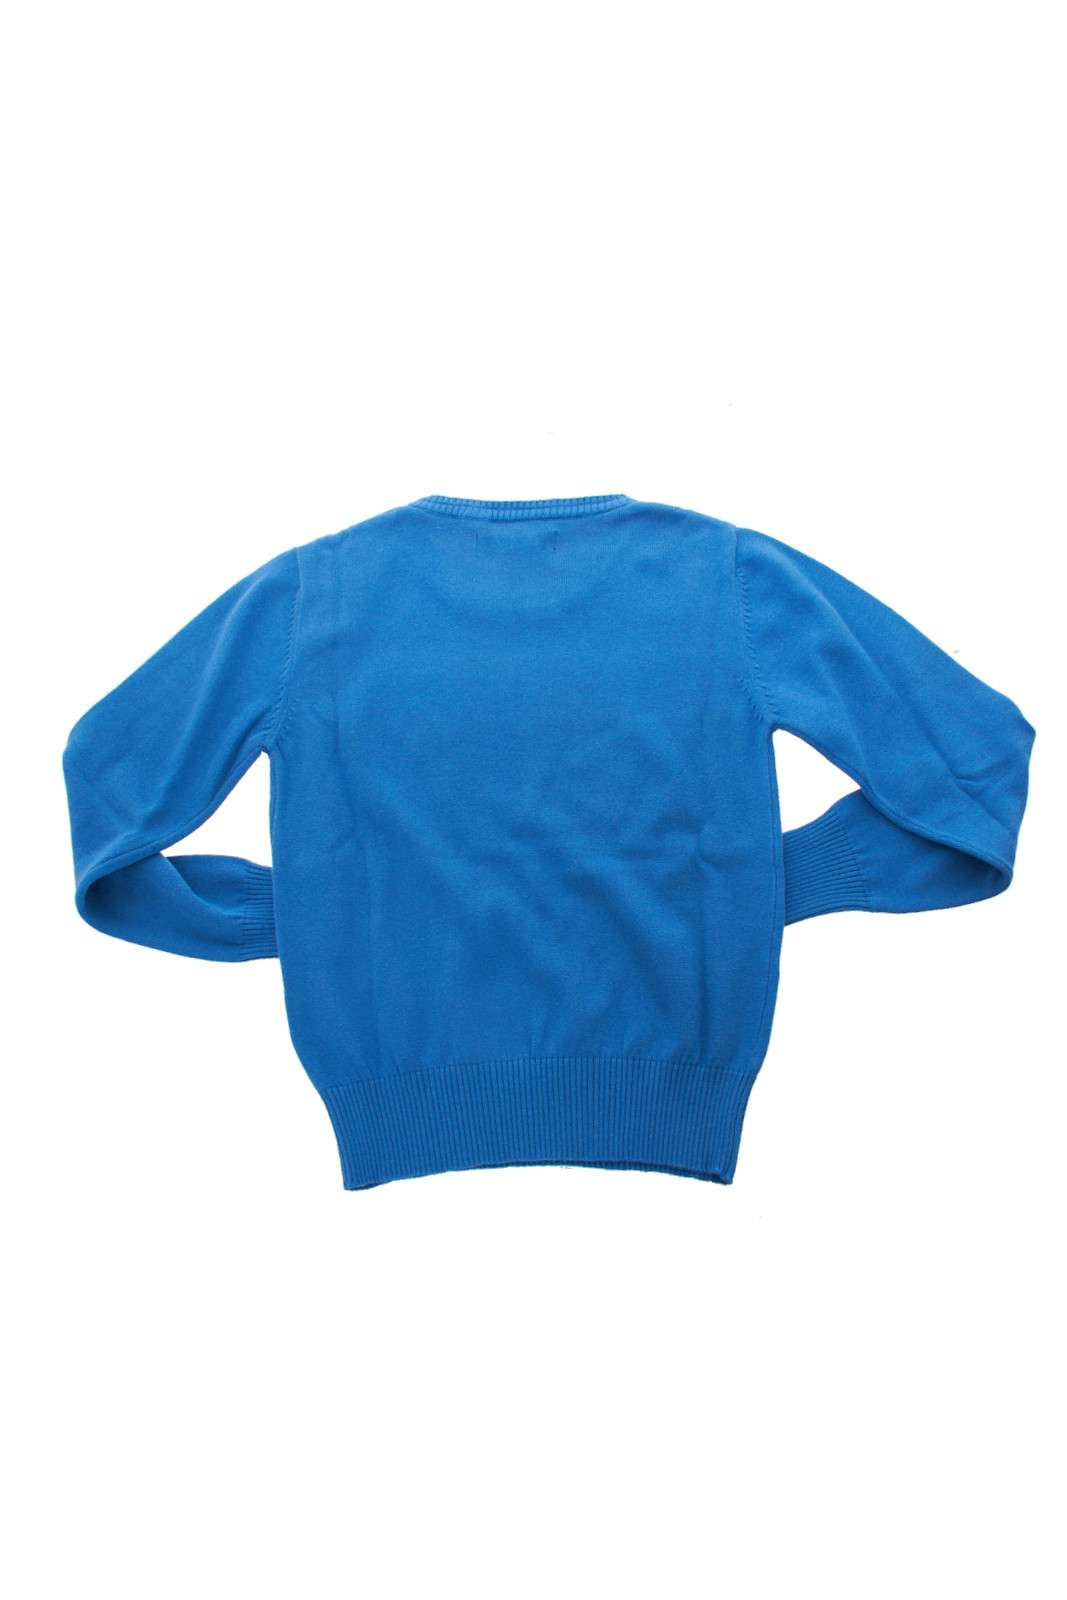 https://www.parmax.com/media/catalog/product/a/i/PE-outlet_parmax-maglia-bambino-Relplay-G21280-B.jpg